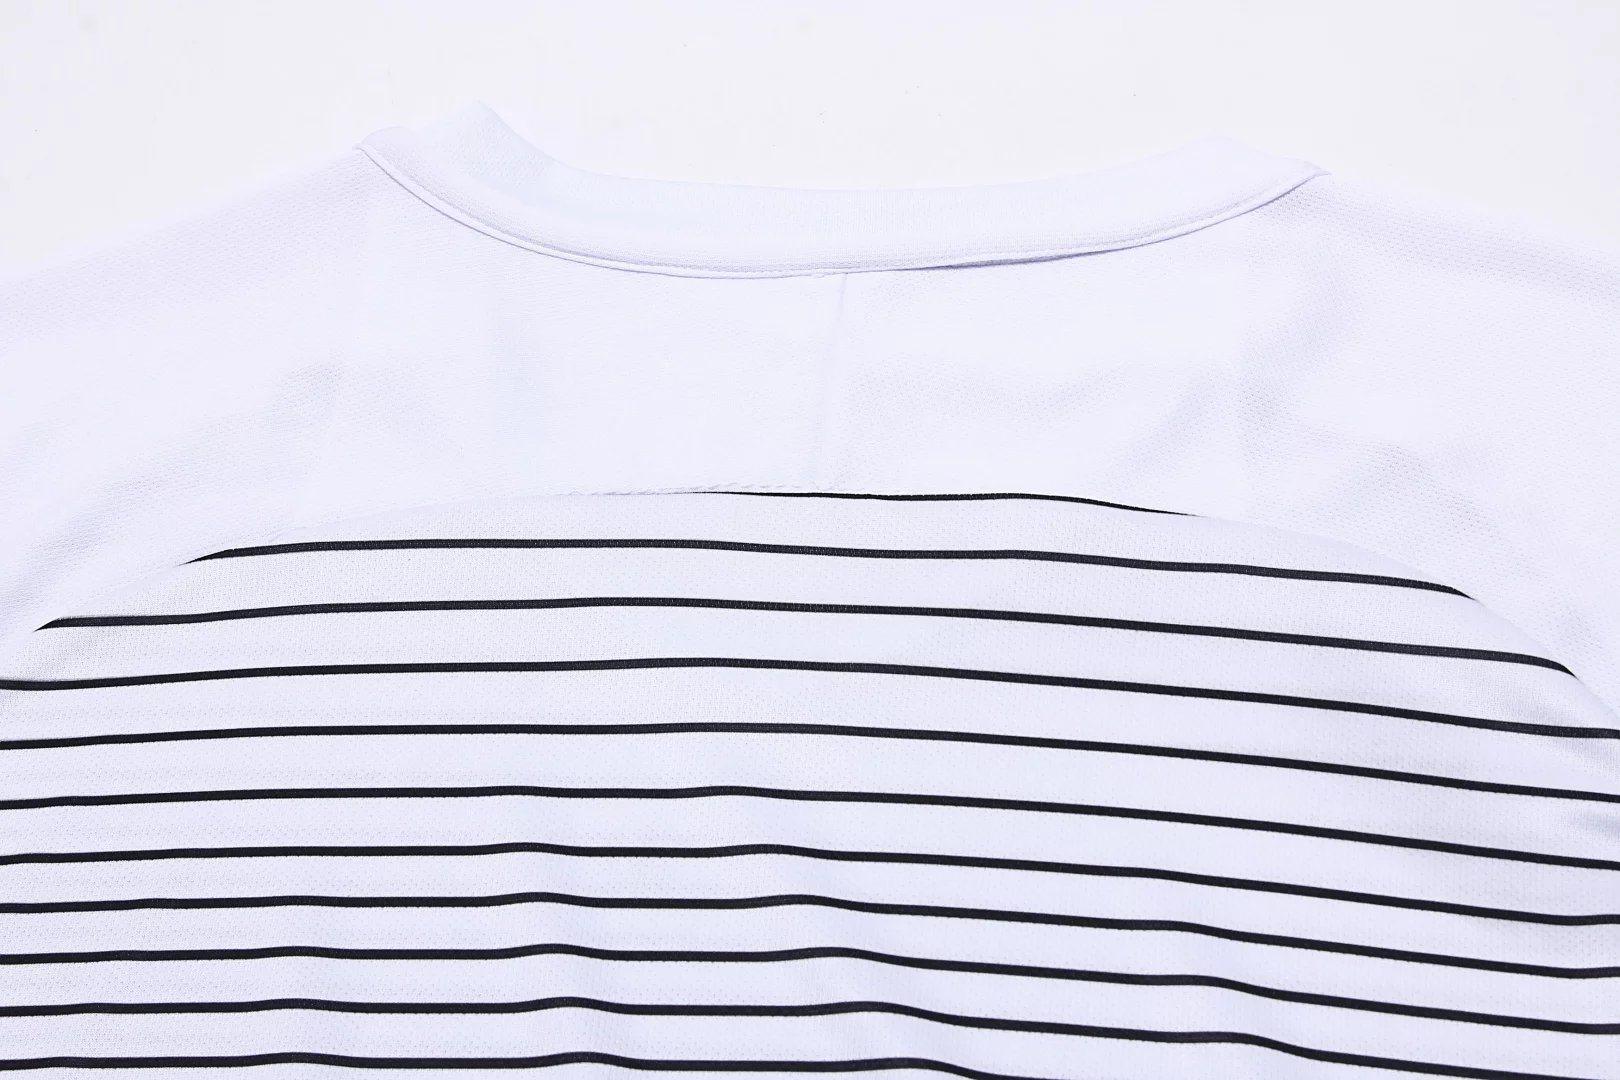 d837b27ca0b3 Buy Football Shirts From China - BCD Tofu House